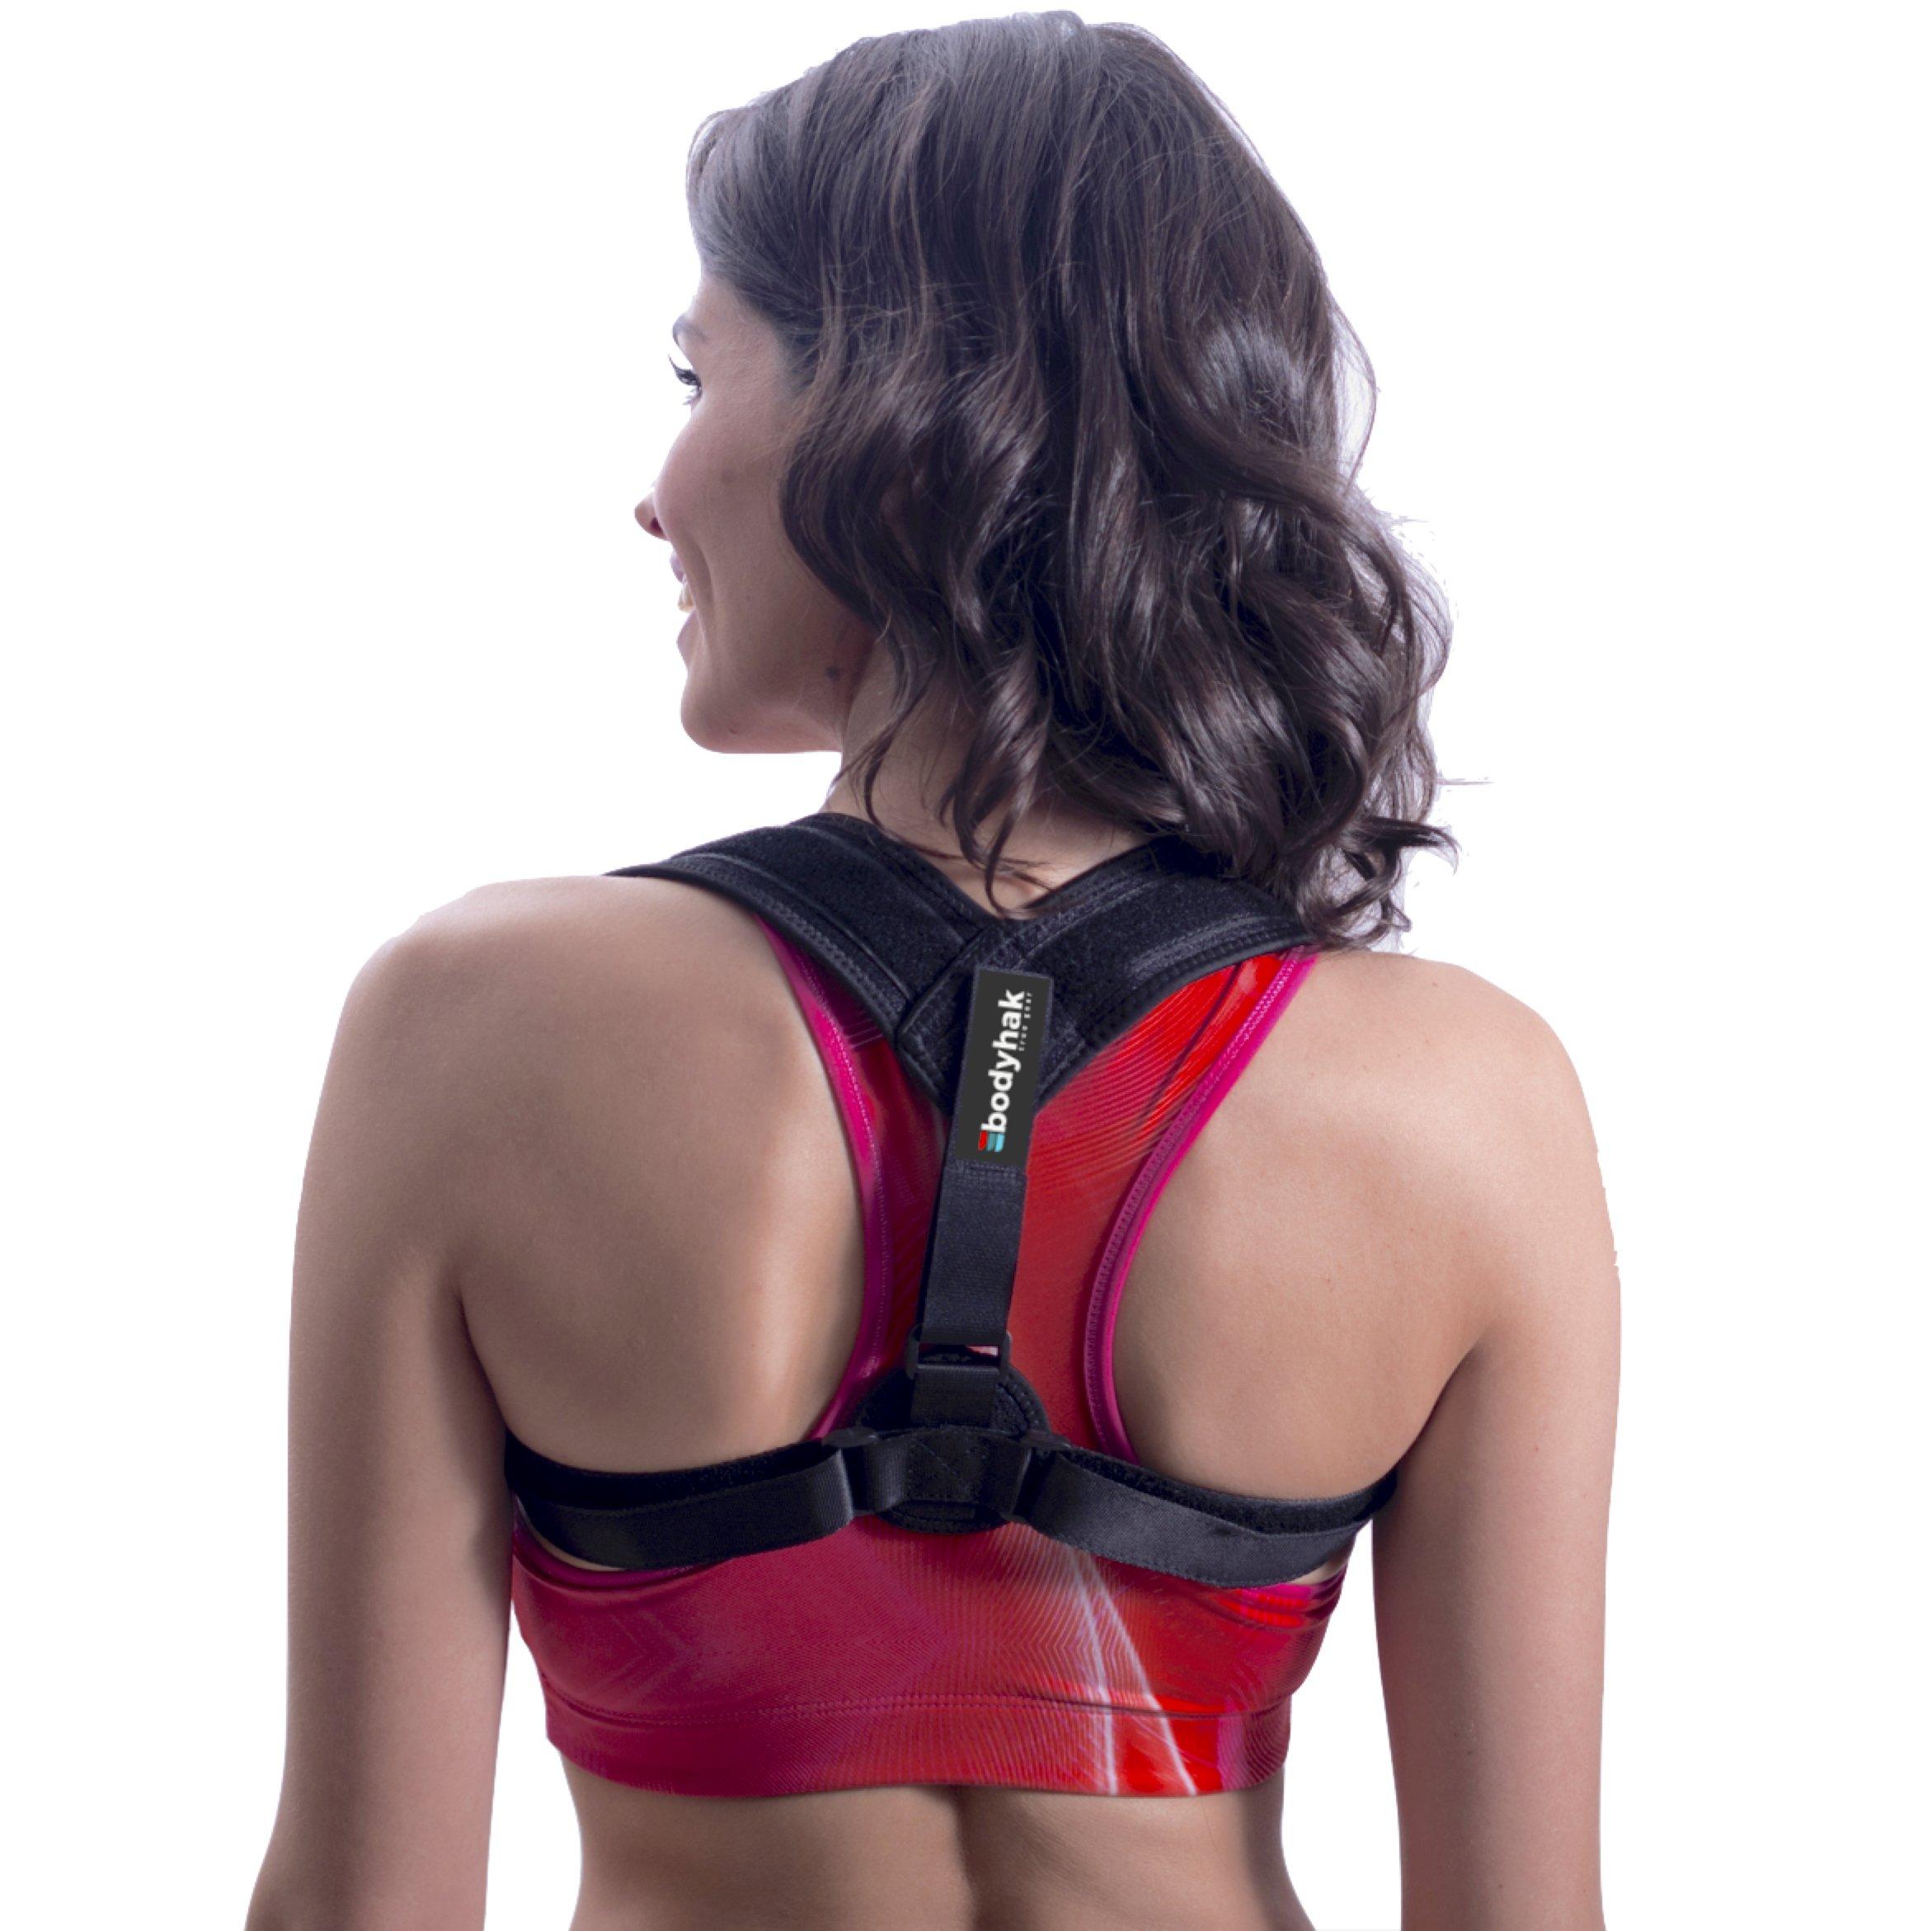 Bodyhak Back posture corrector for women and men - Adjustable upper back brace for shoulder and clavicle support - Improve bad posture - relieve neck & back pain - invisible under clothes